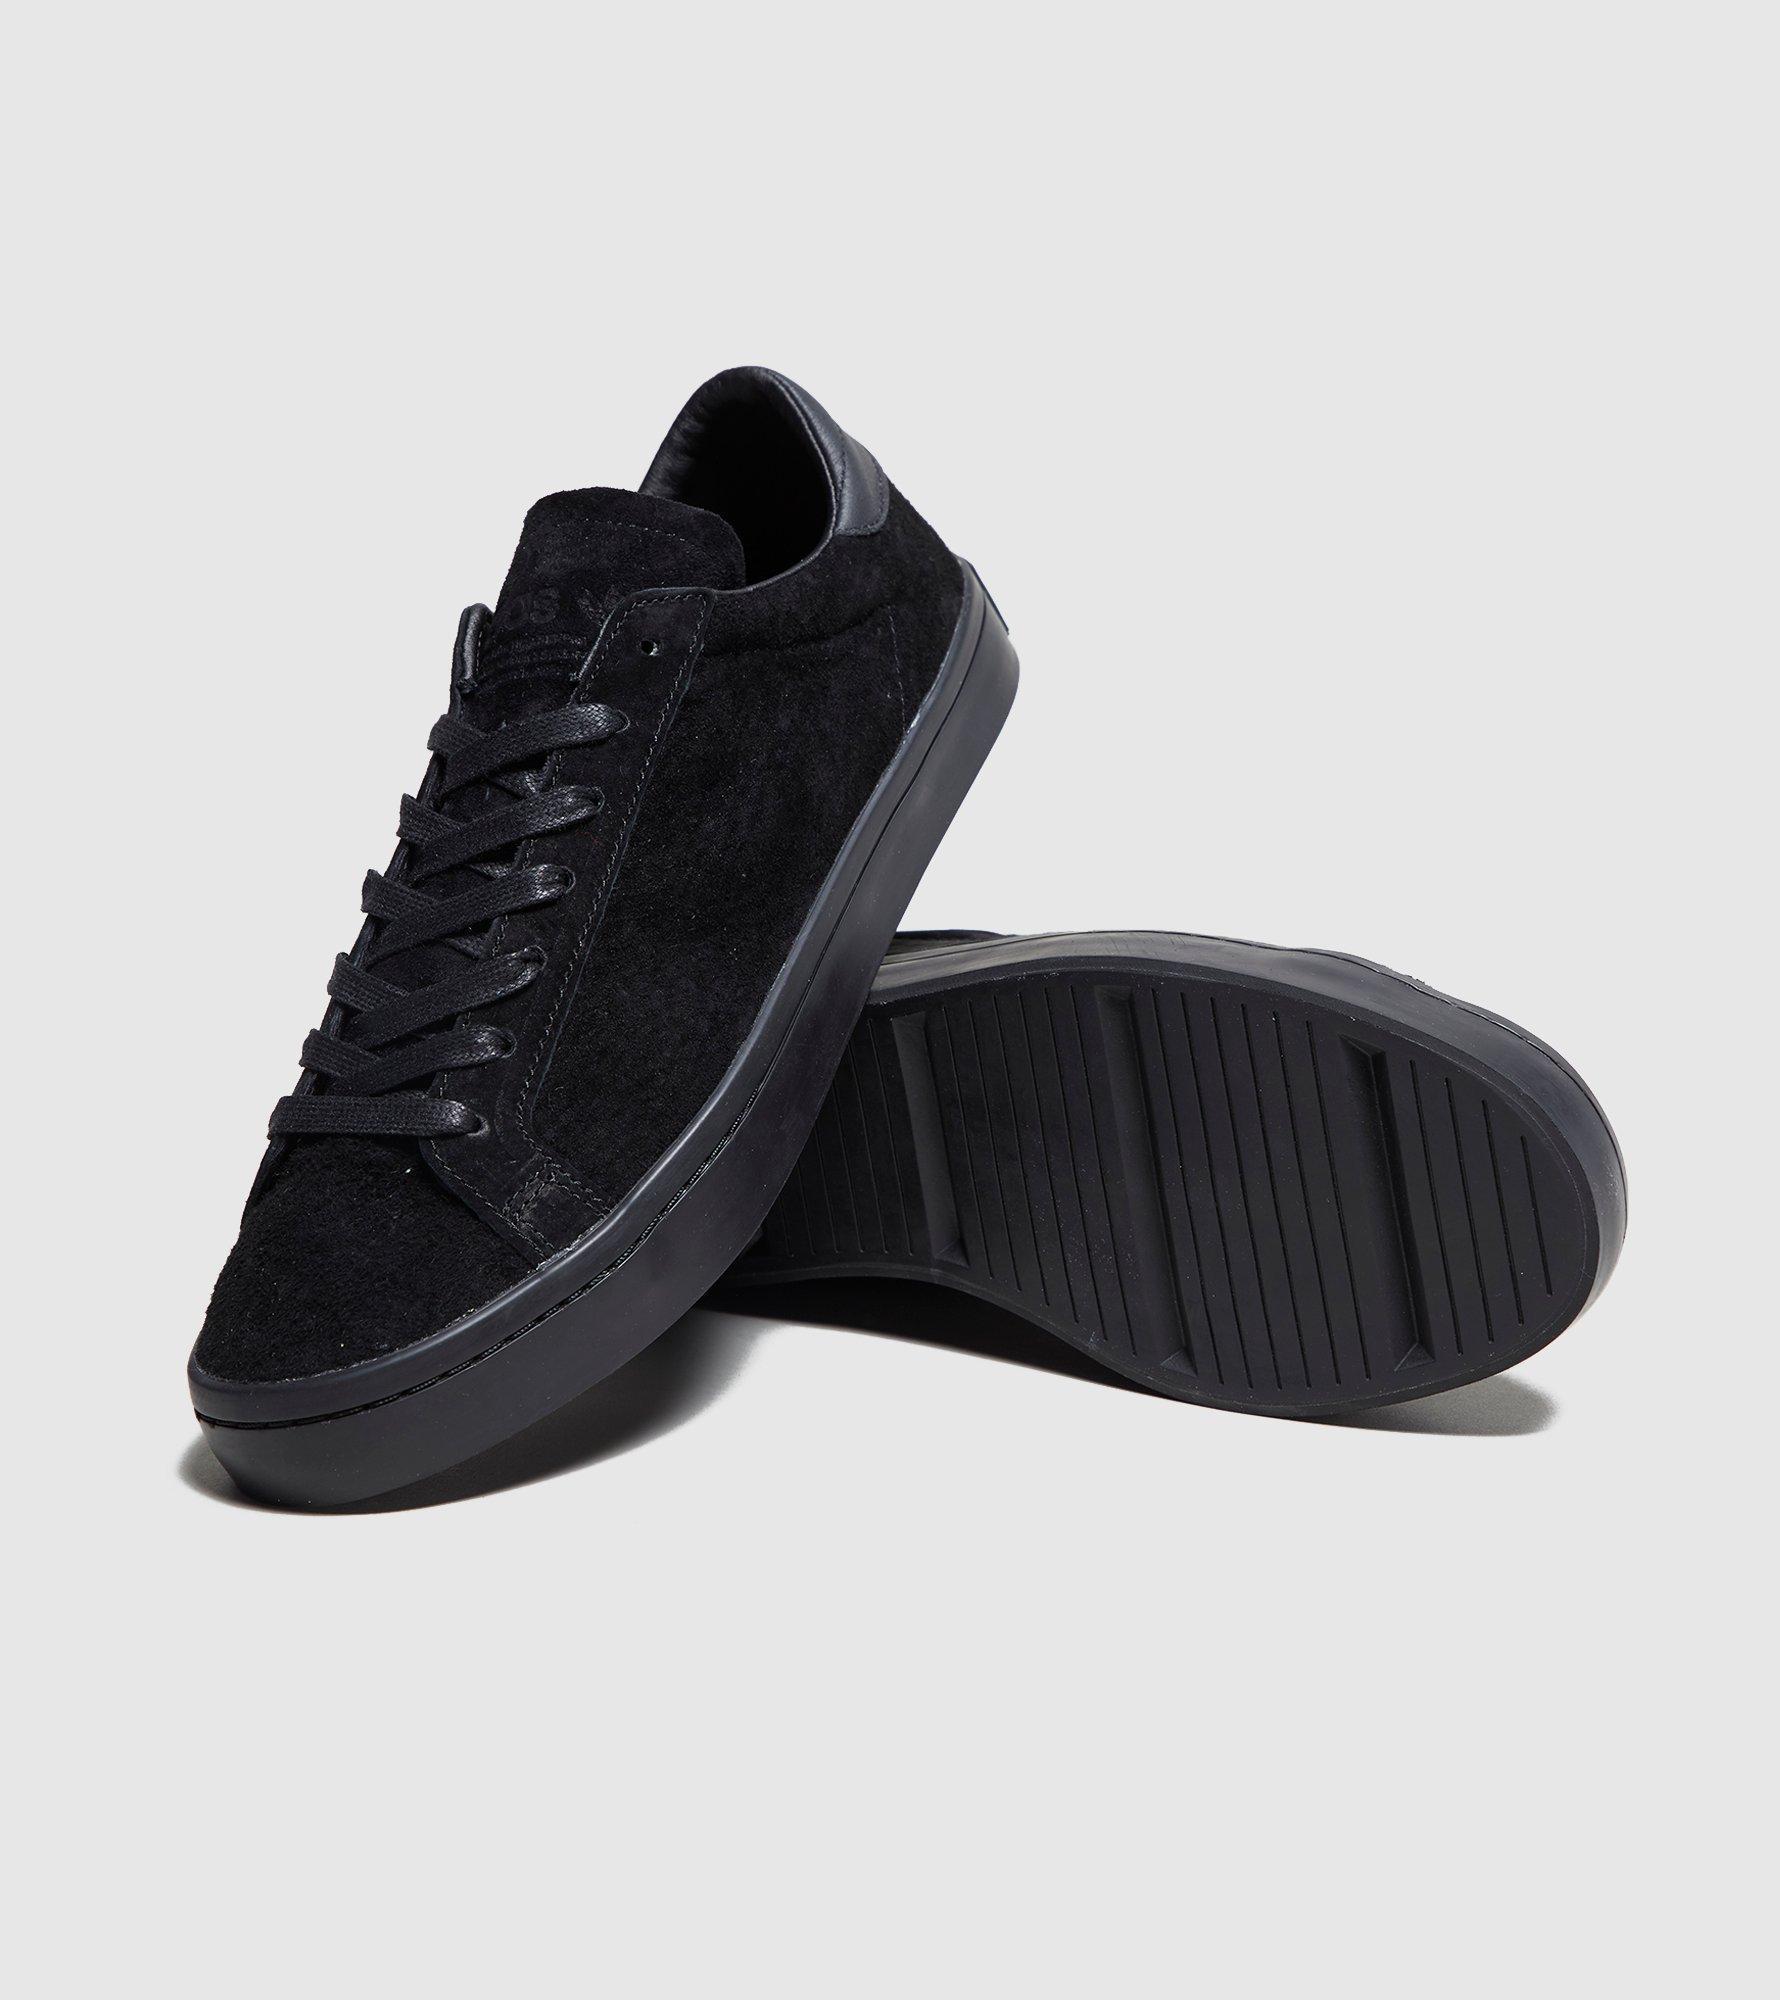 timeless design da86f e9560 Adidas Originals Court Vantage Suede in Black for Men - Lyst